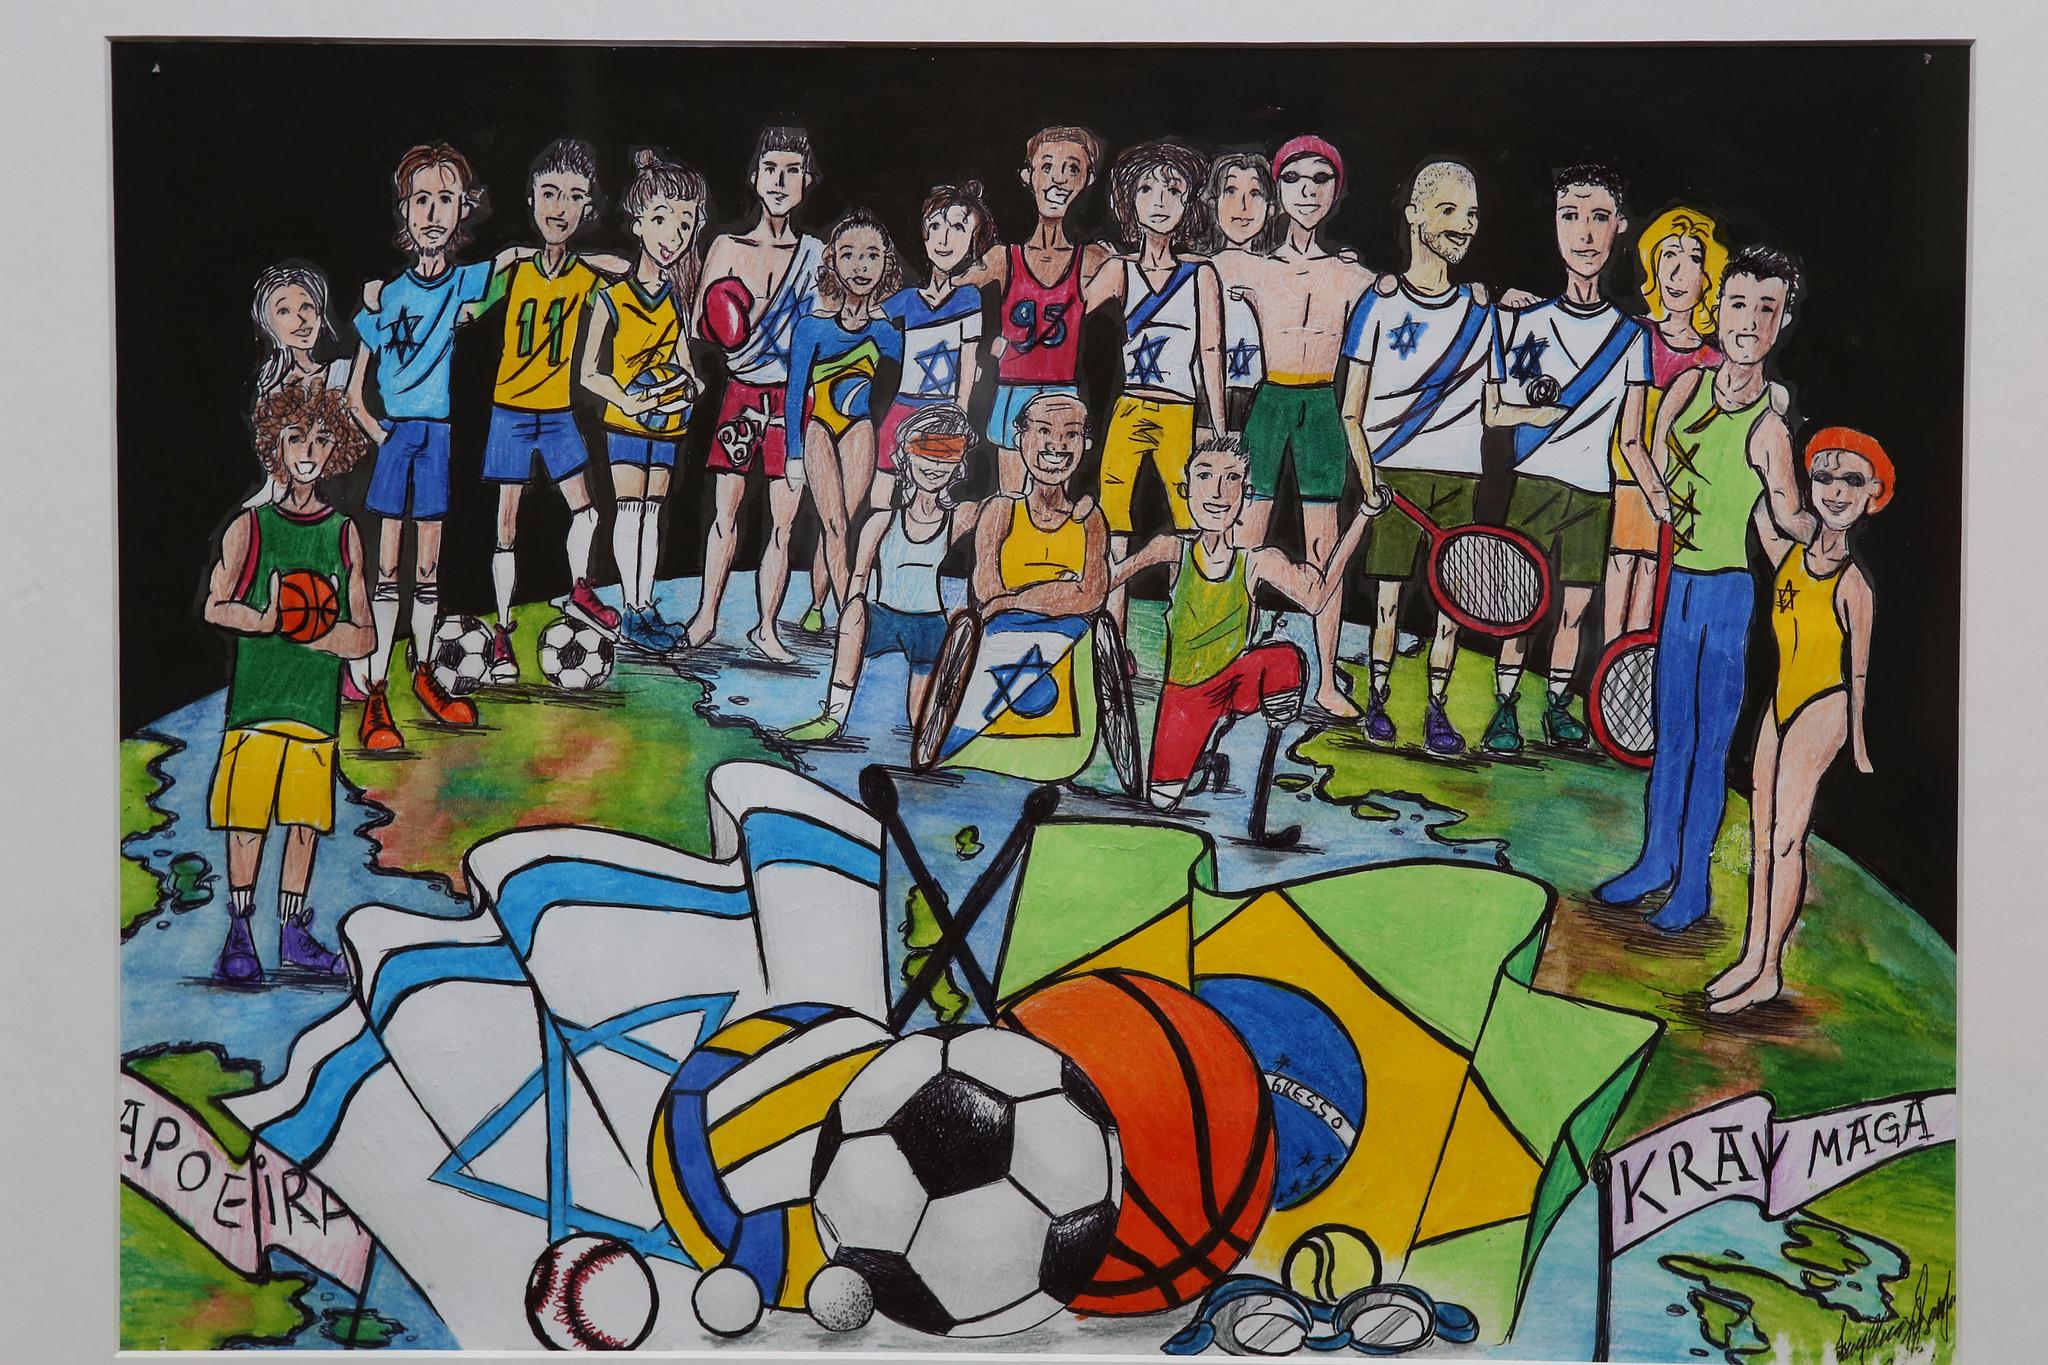 Alunos Vencedores Do Concurso De Pintura E Desenho Wizo Serao